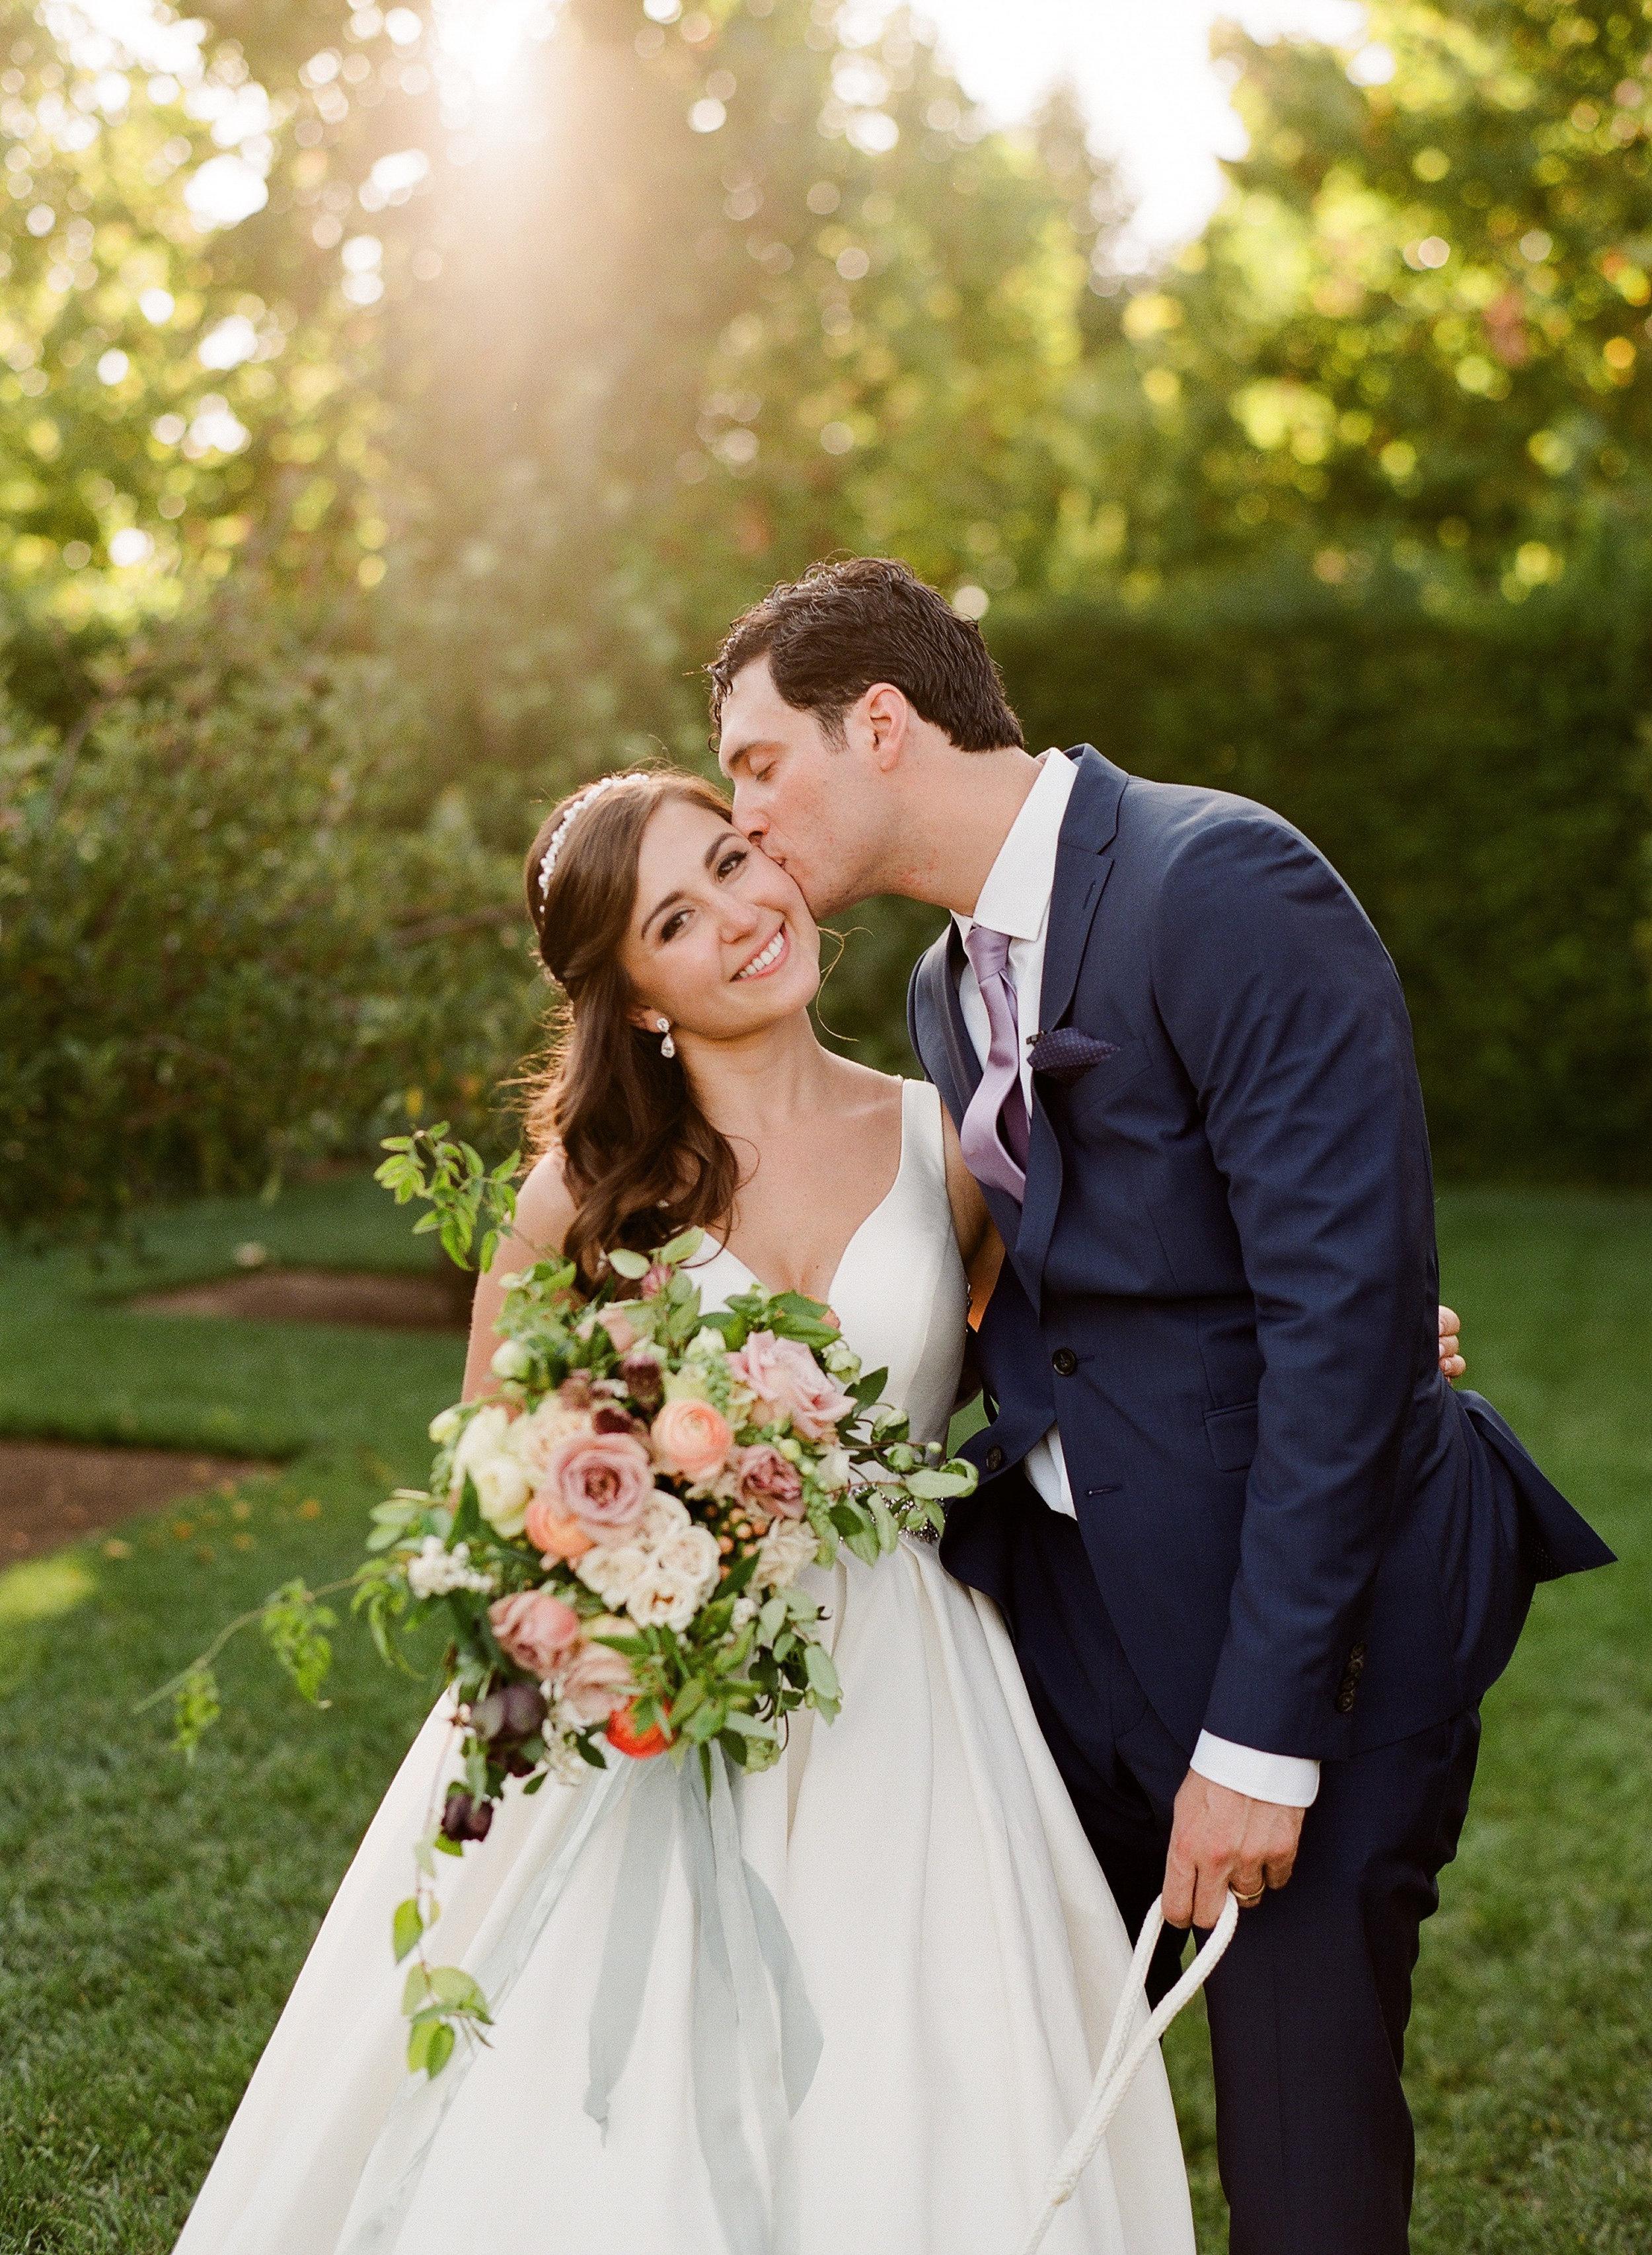 santa-barbara-elopement-elope-wedding-planner-planning-coordinator-day-of-intimate-event-design-kestrel-park-santa-ynez-english-country-estate-garden-castle (16).jpg